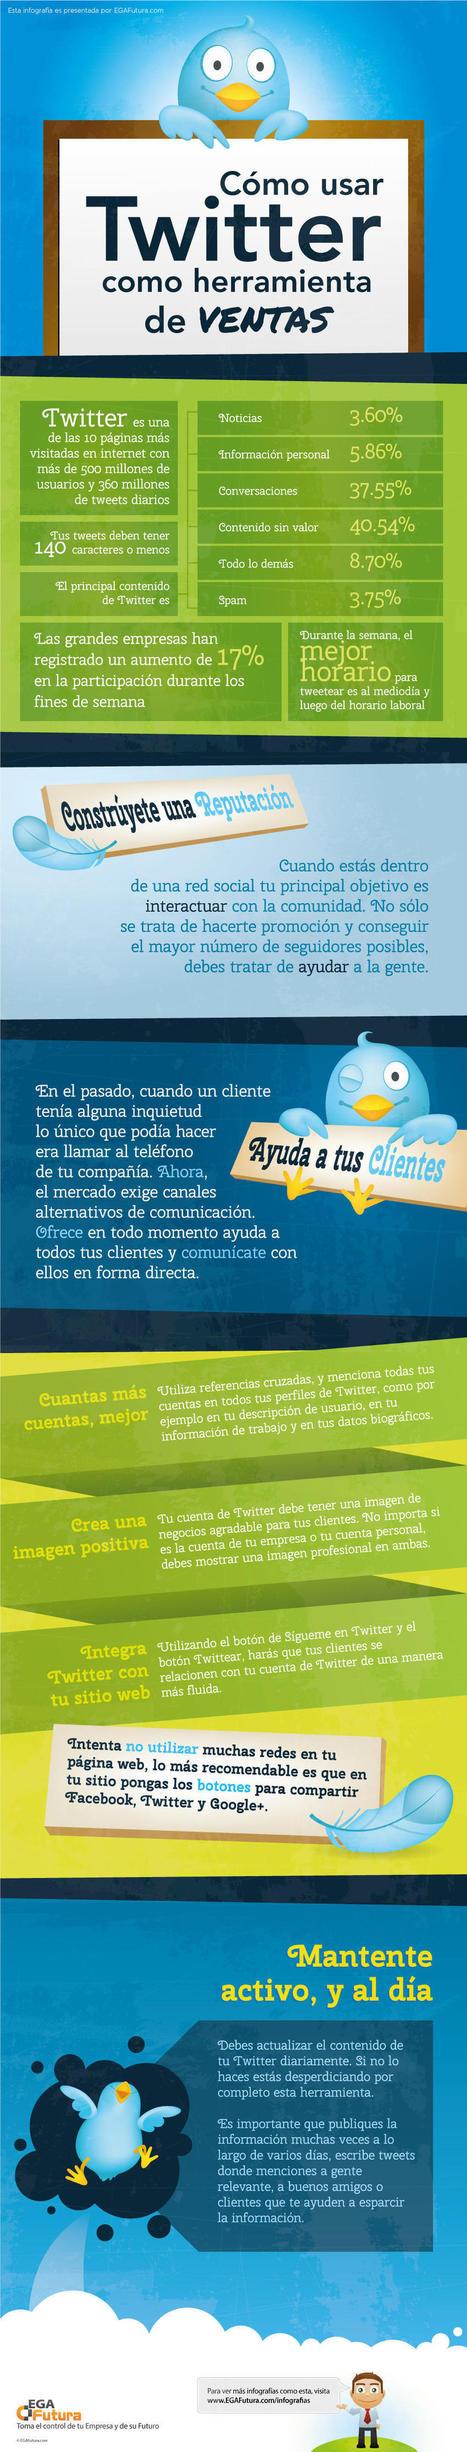 Cómo usar Twitter como herramienta de ventas #infografia #infographic #socialmedia #marketing | Infograf | Scoop.it